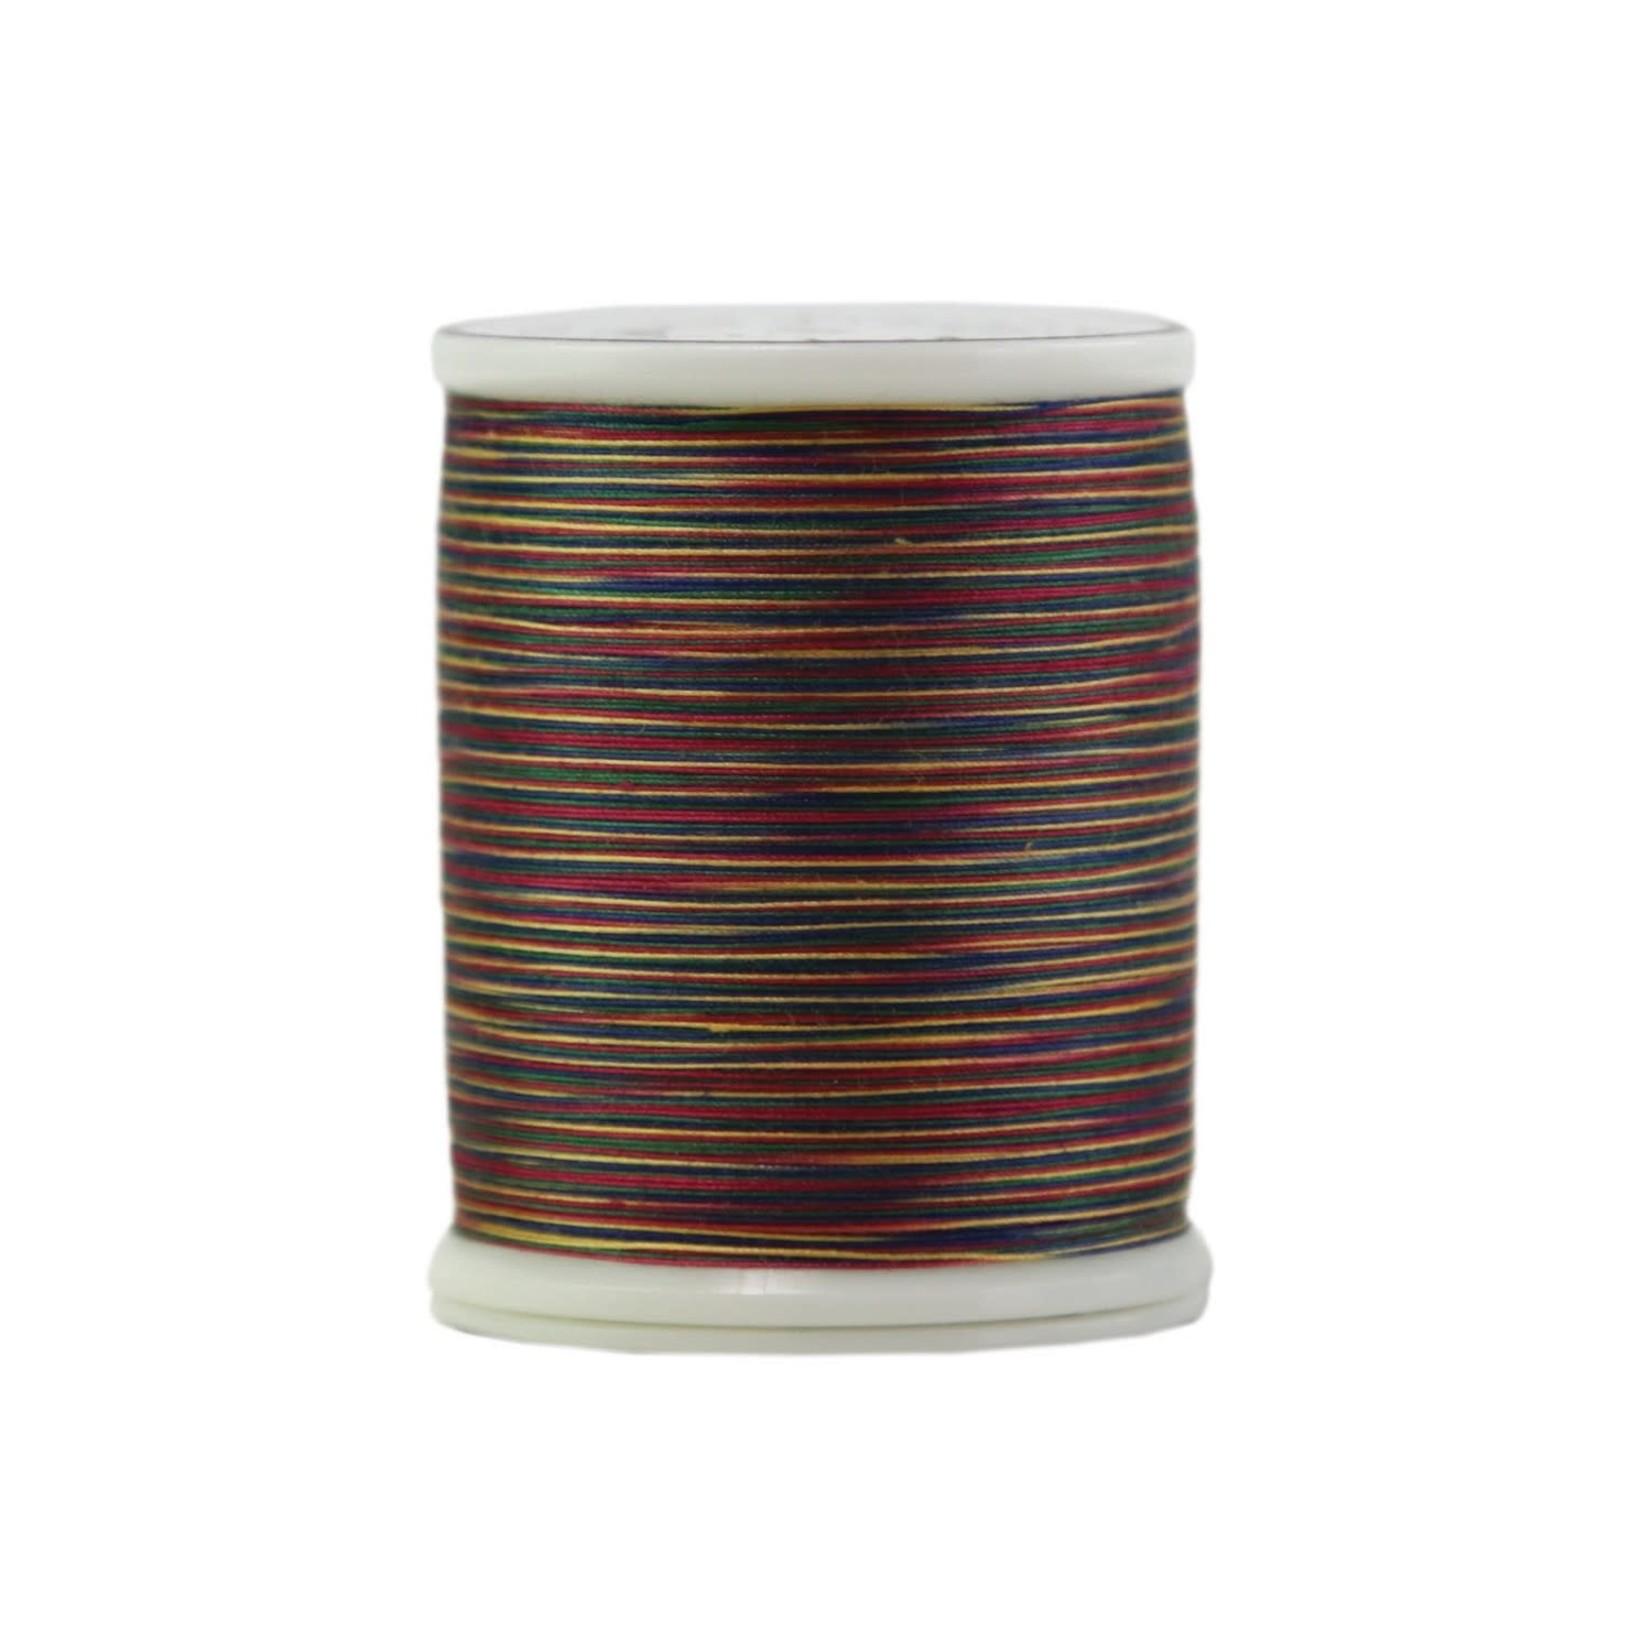 Superior Threads King Tut - #40 - 457 m - 1044 Kansas